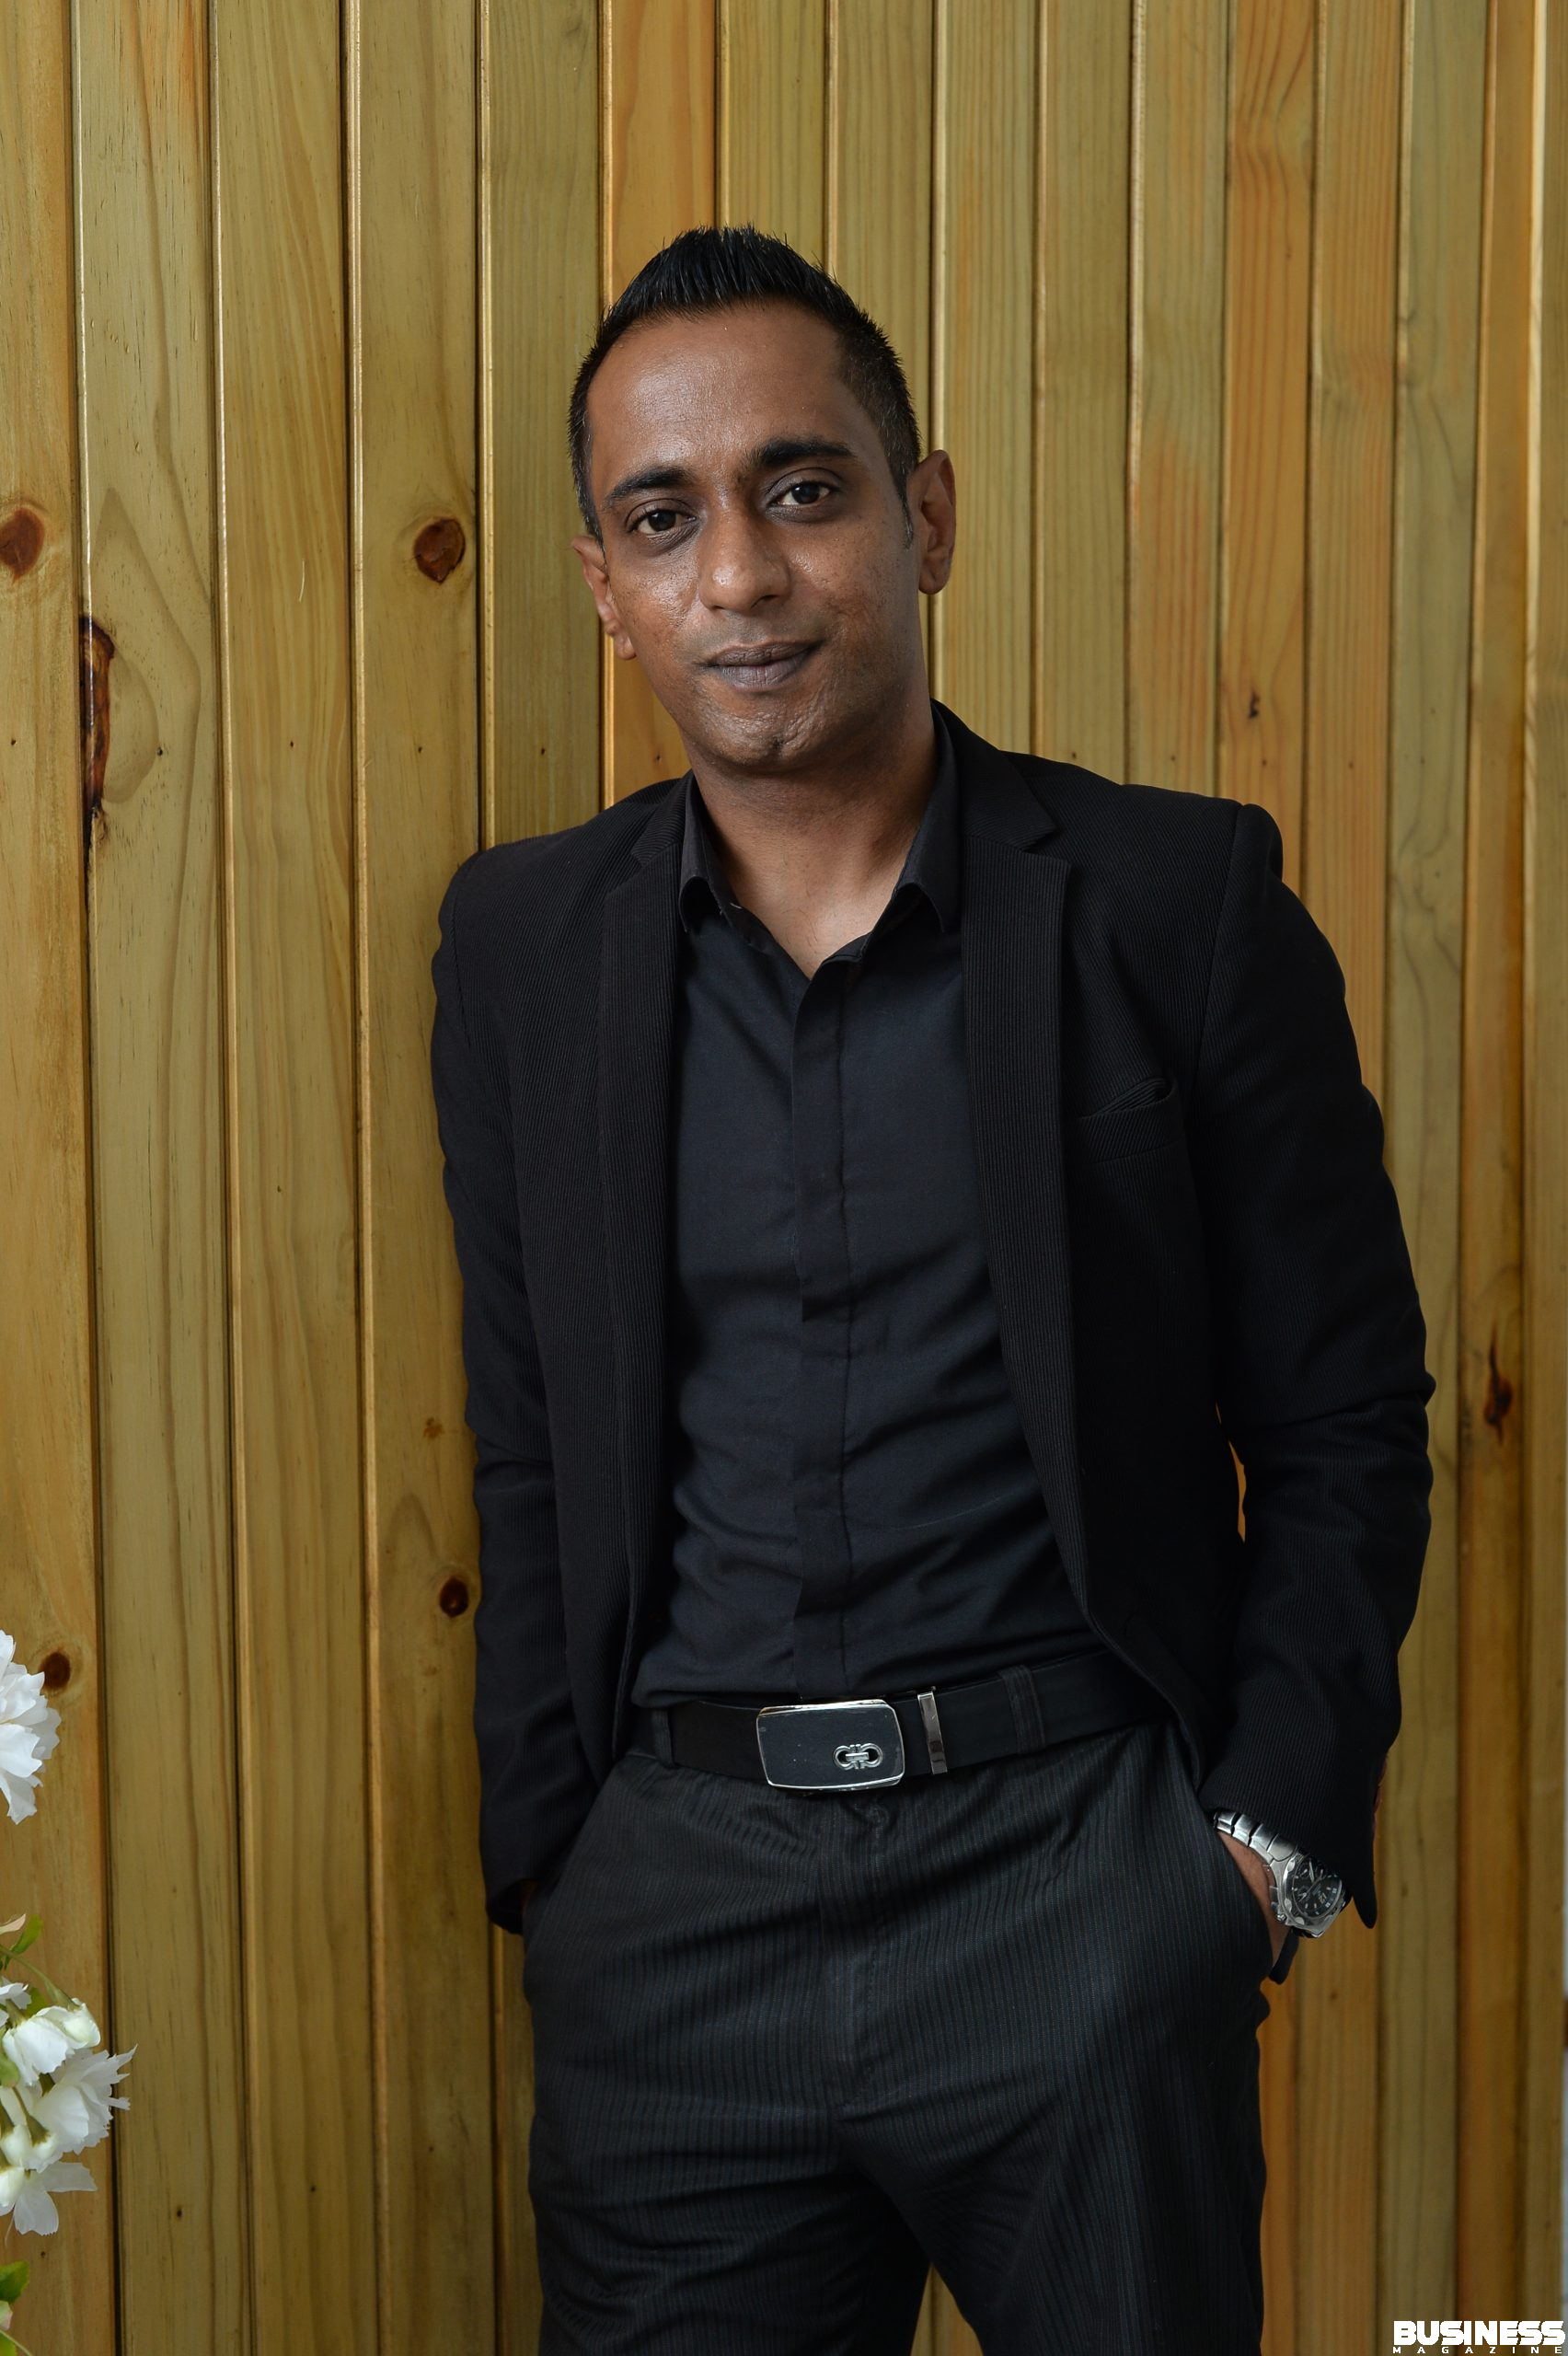 Ravish Pothegadoo